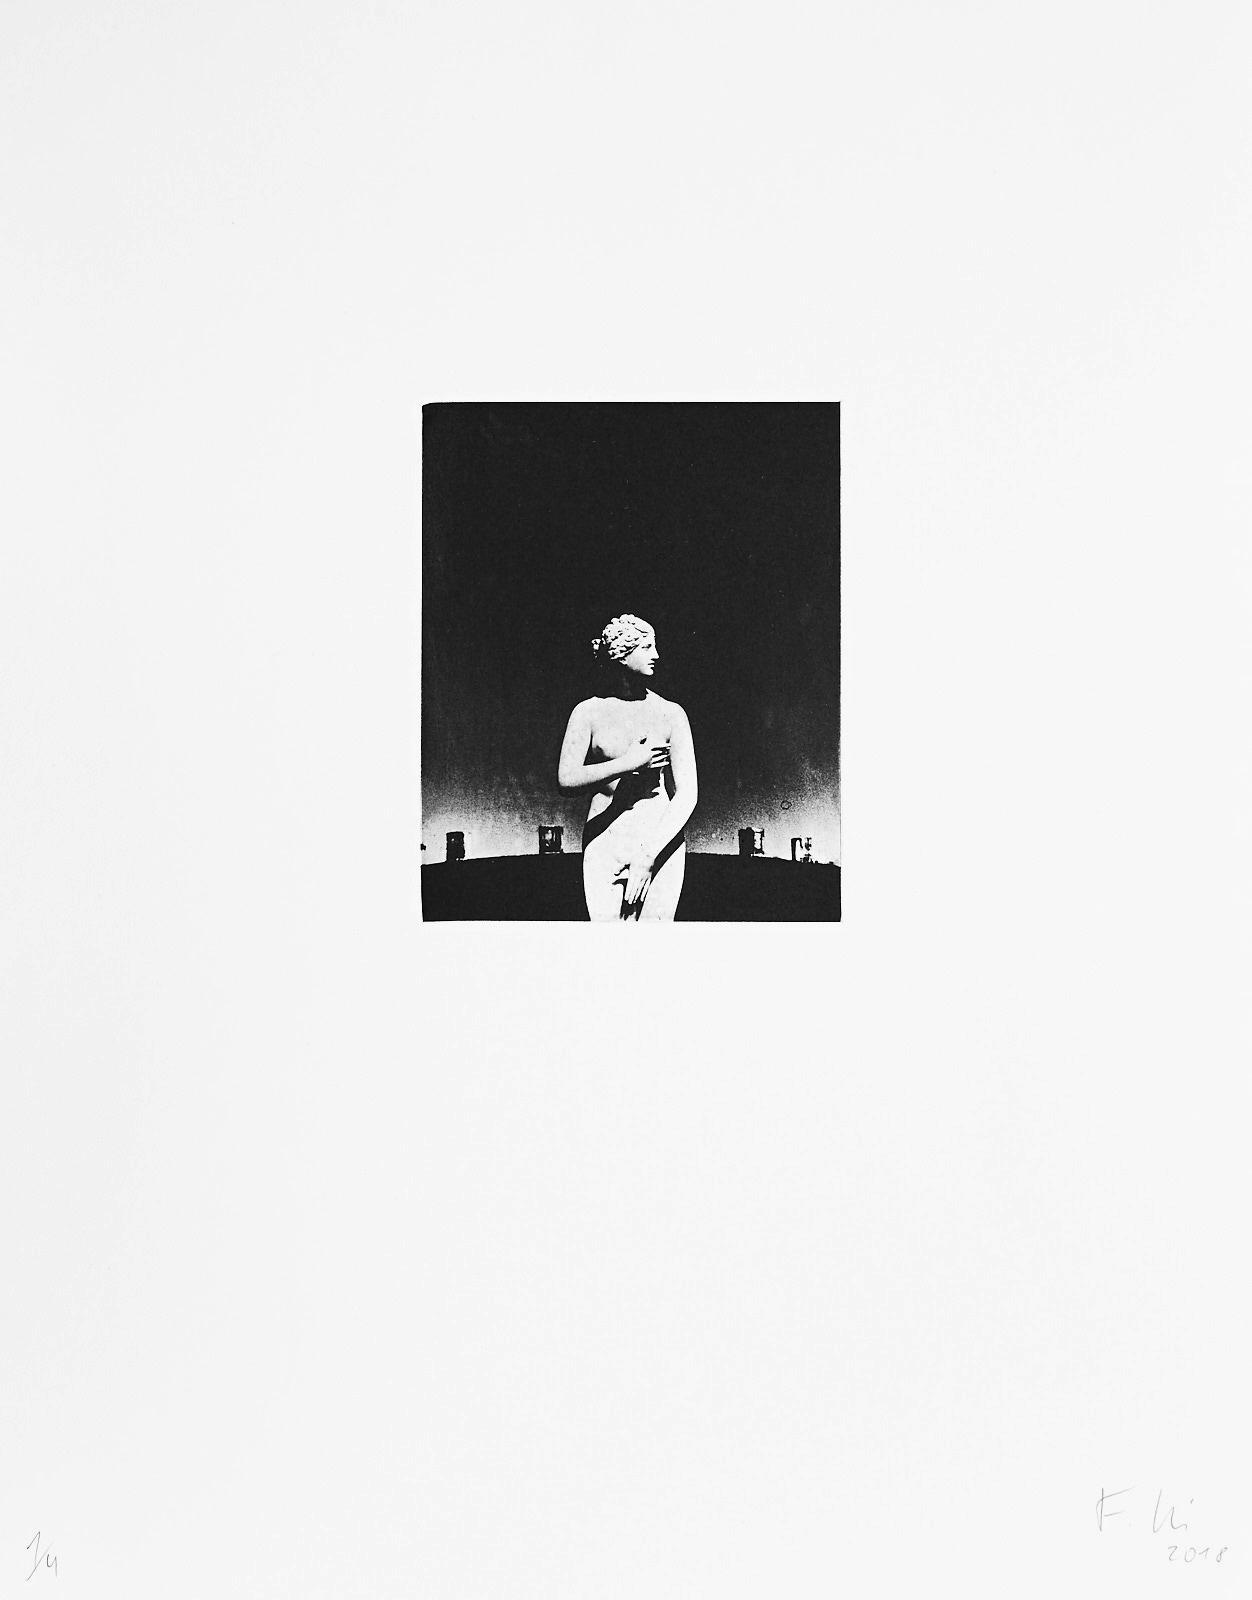 o.T.[Typologien#5]  (2018)  medium: Photogravure  size: 36 x 46 cm  paper: Zerkall 270 g/qm  plate: 11.7 x 14.7 cm  edition: 6 copies  numbered: 1/4 - 4/4, 2 e.a.  printer: FWU